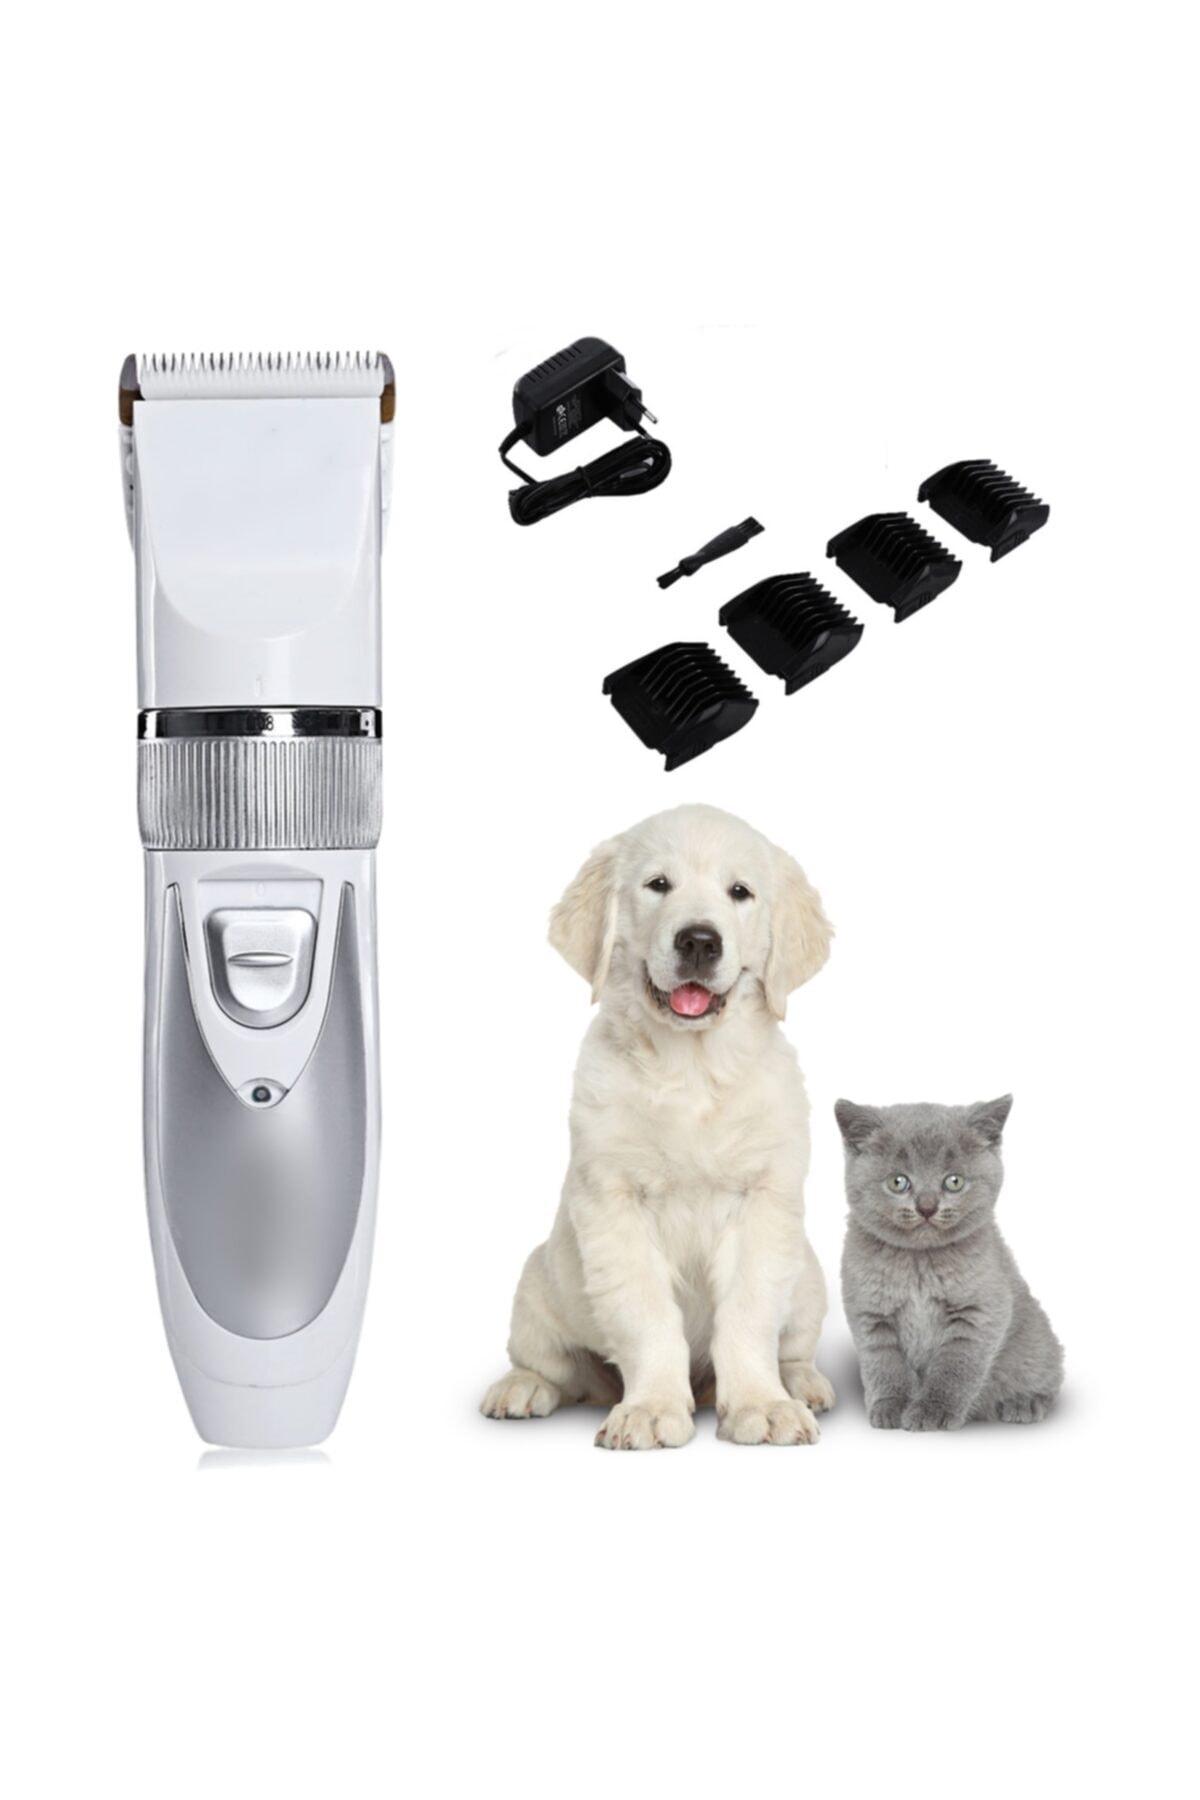 Çift Bataryalı Evcil Hayvan Tüy Kesme Kedi Köpek Traş Tıraş Makinesi Seti